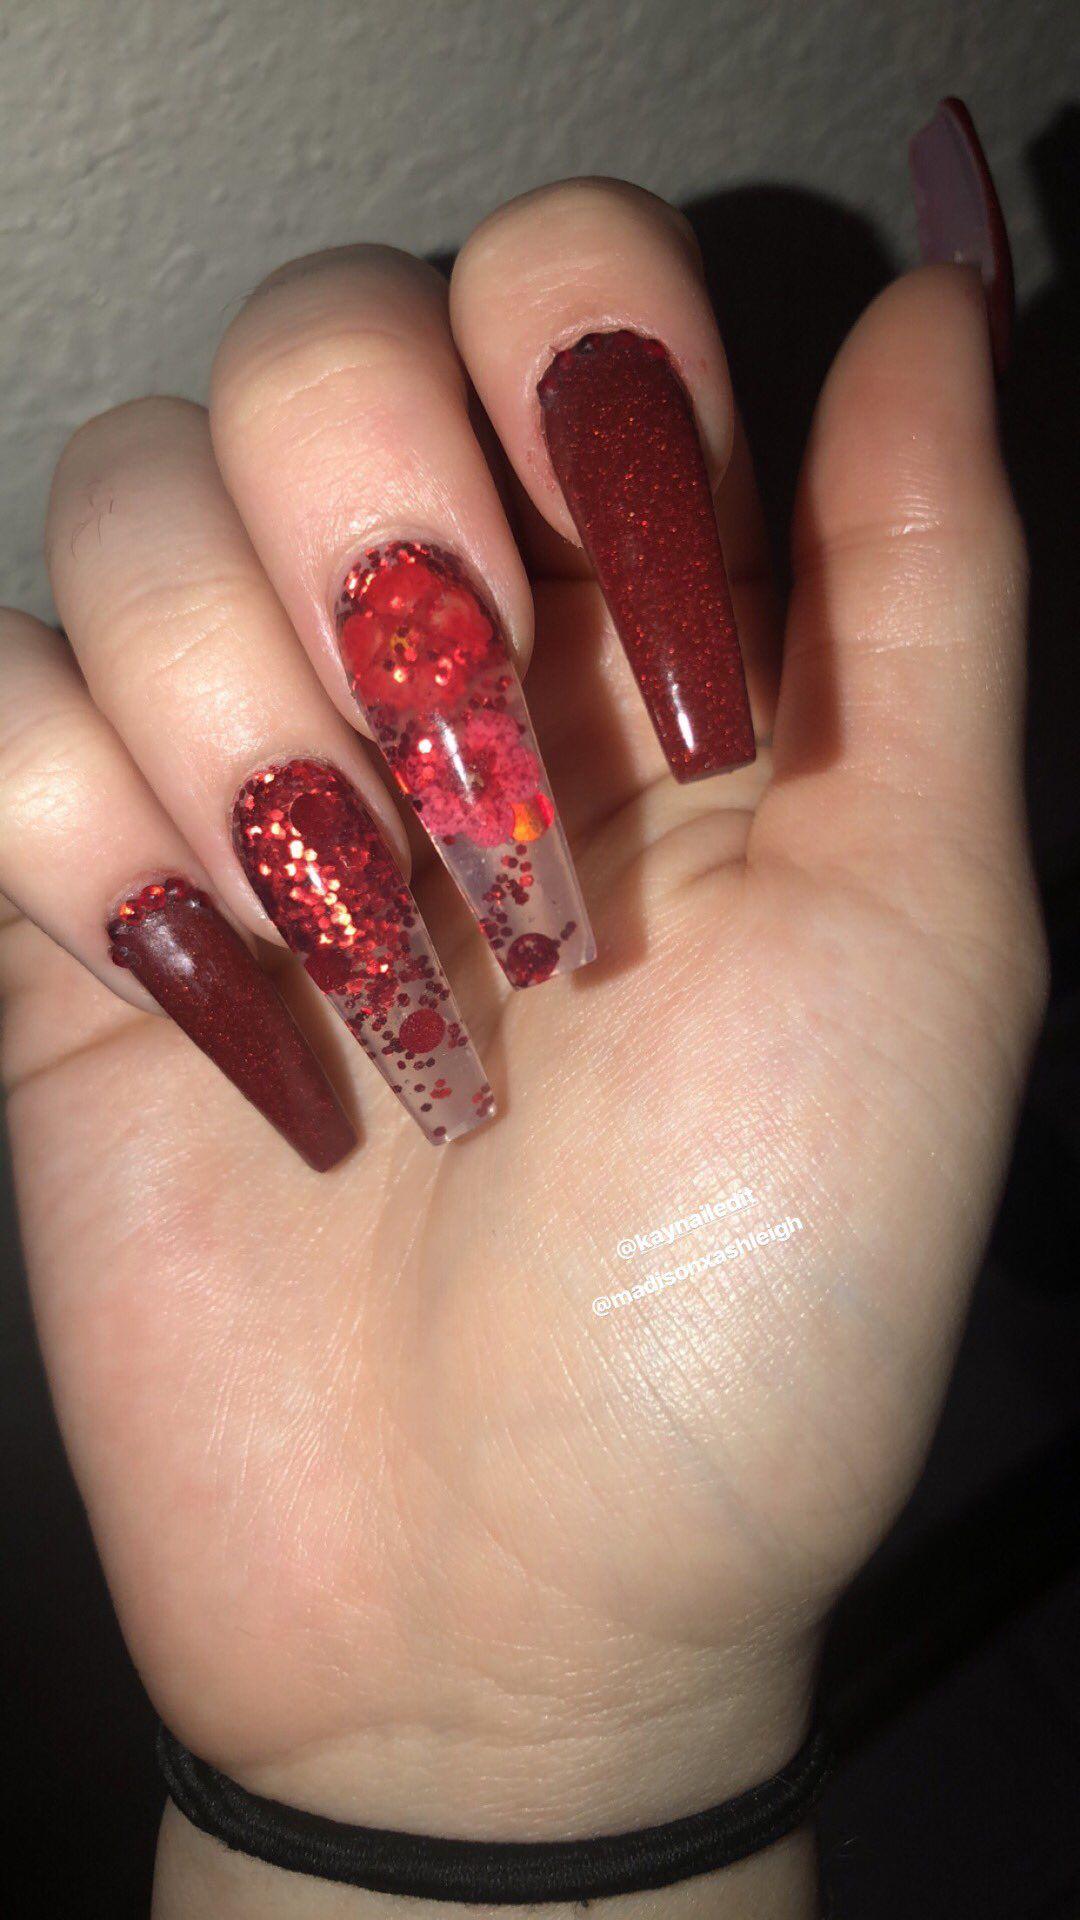 Lilshawtybad Graduation Nails Red Nails Glitter Transparent Nails